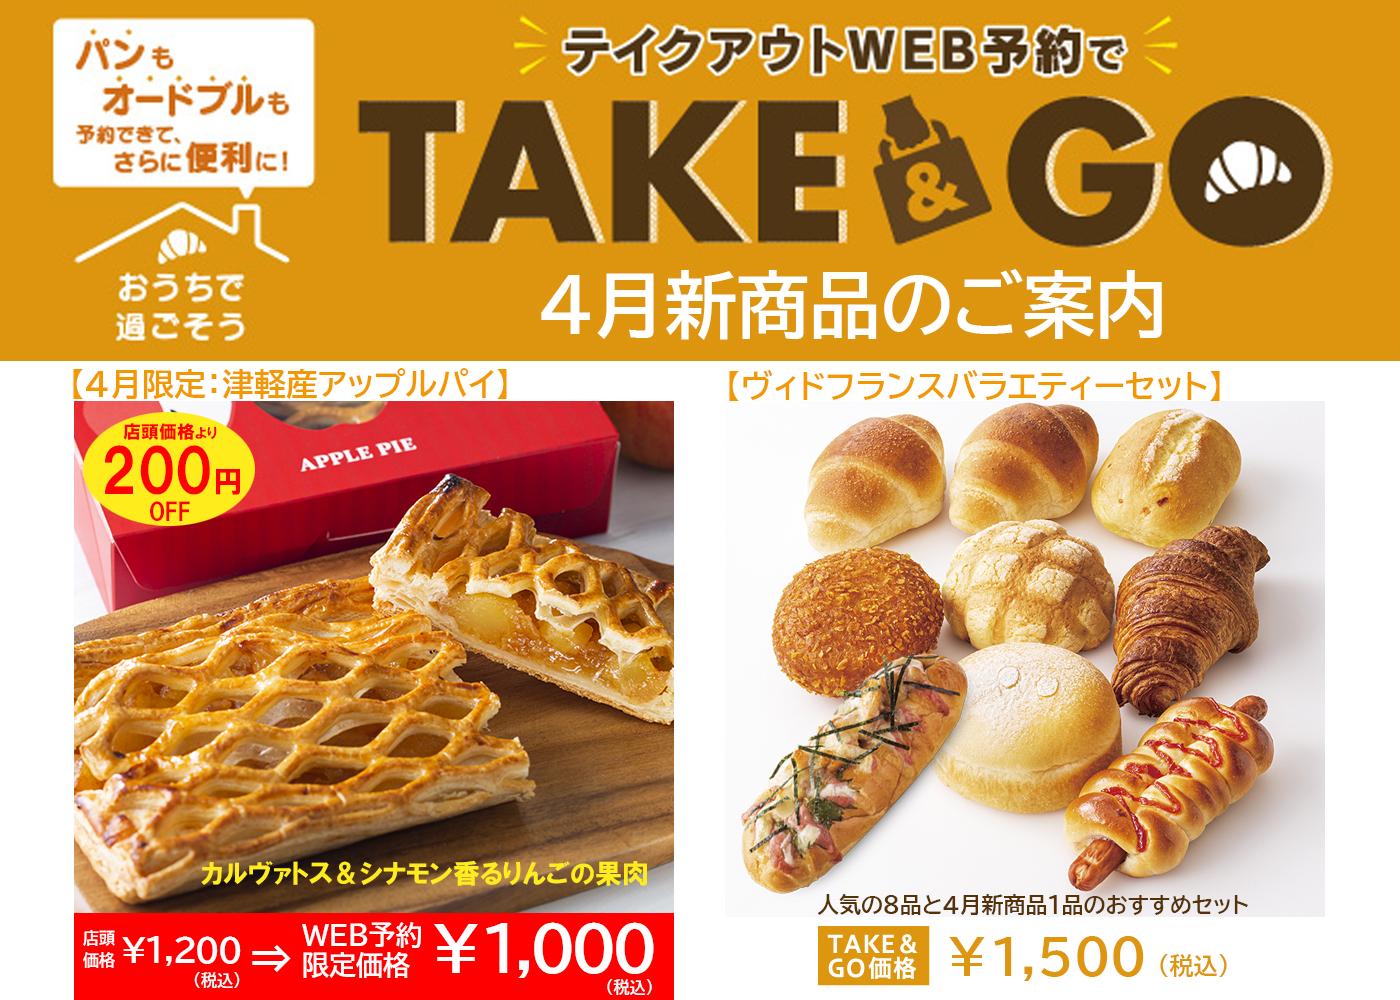 WEB予約に新商品登場!